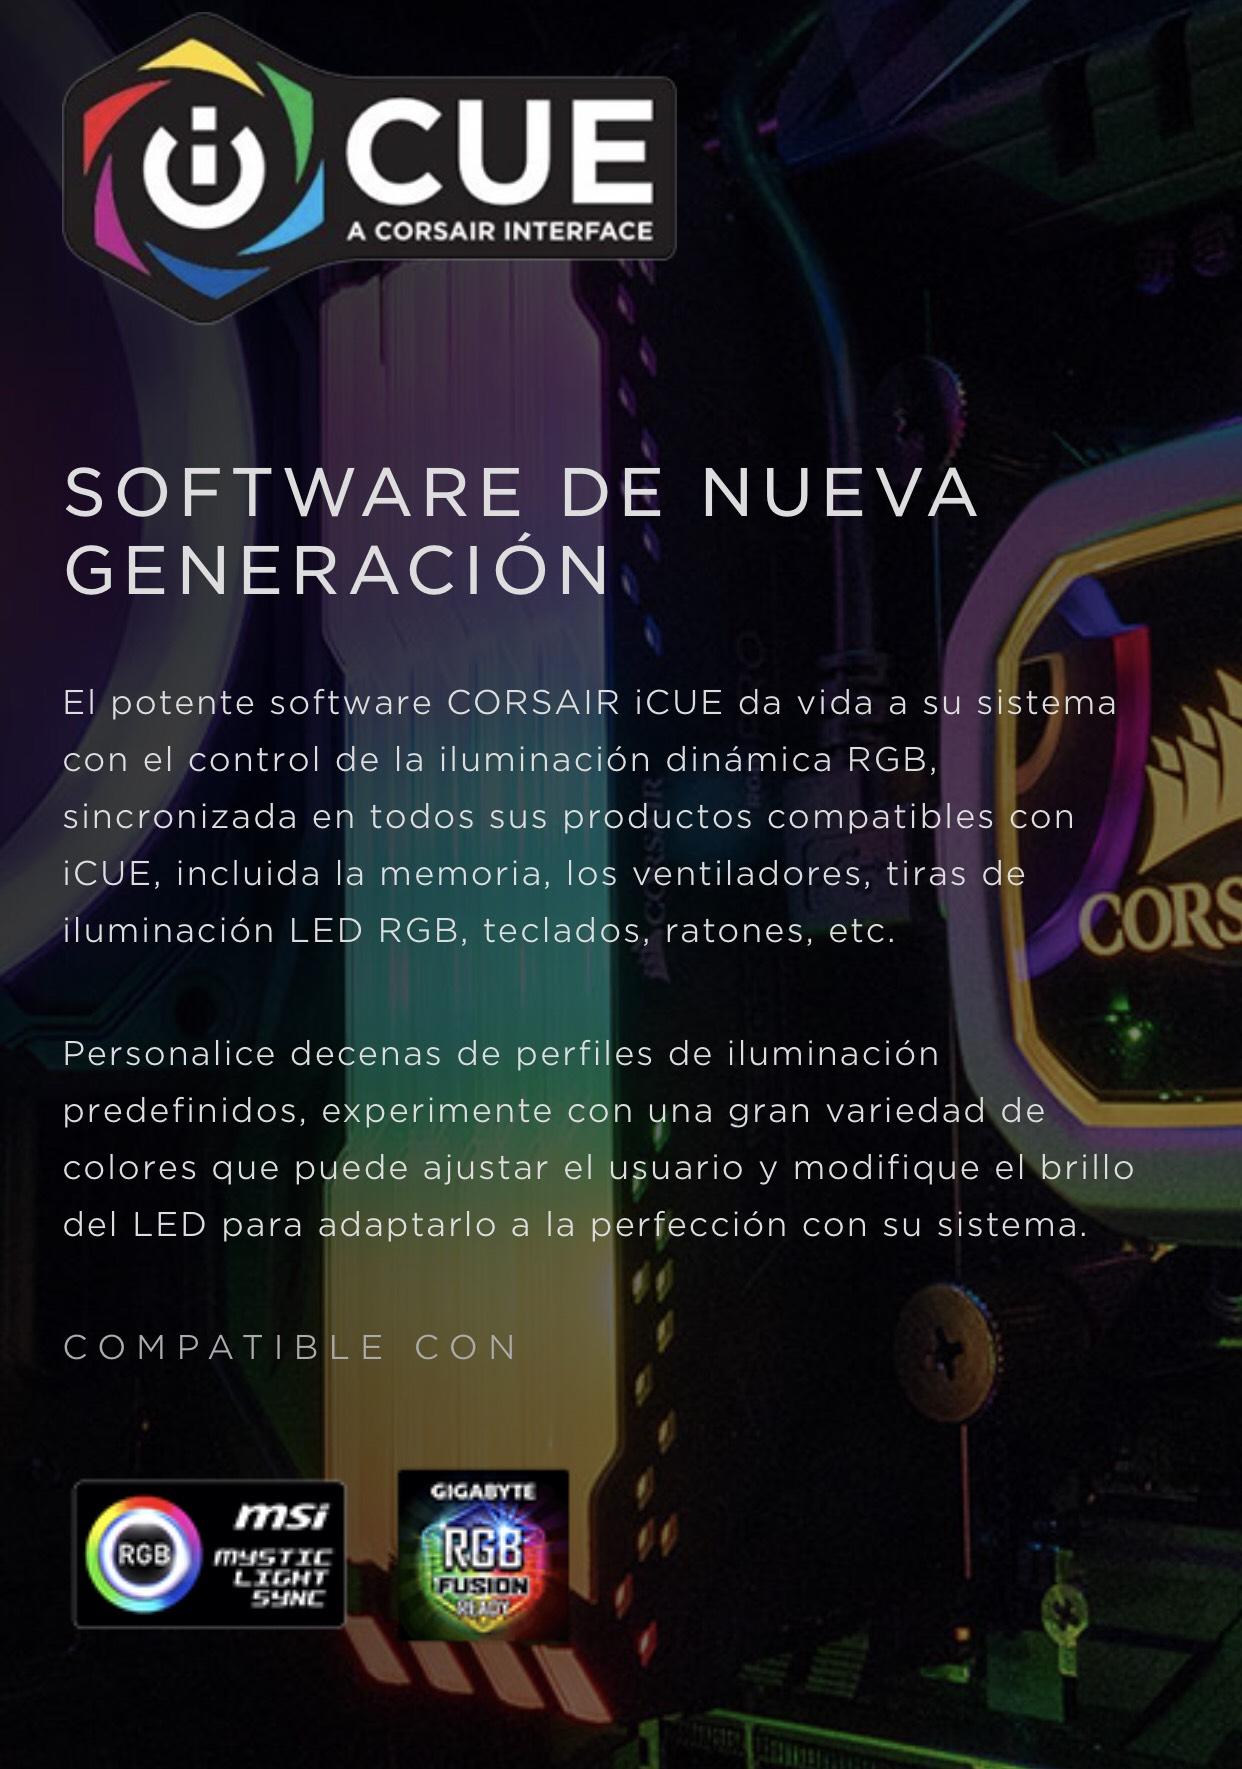 Corsair Vengeance RGB Pro - 16 GB (2 x 8 GB), DDR4, 3200 MHz, C16